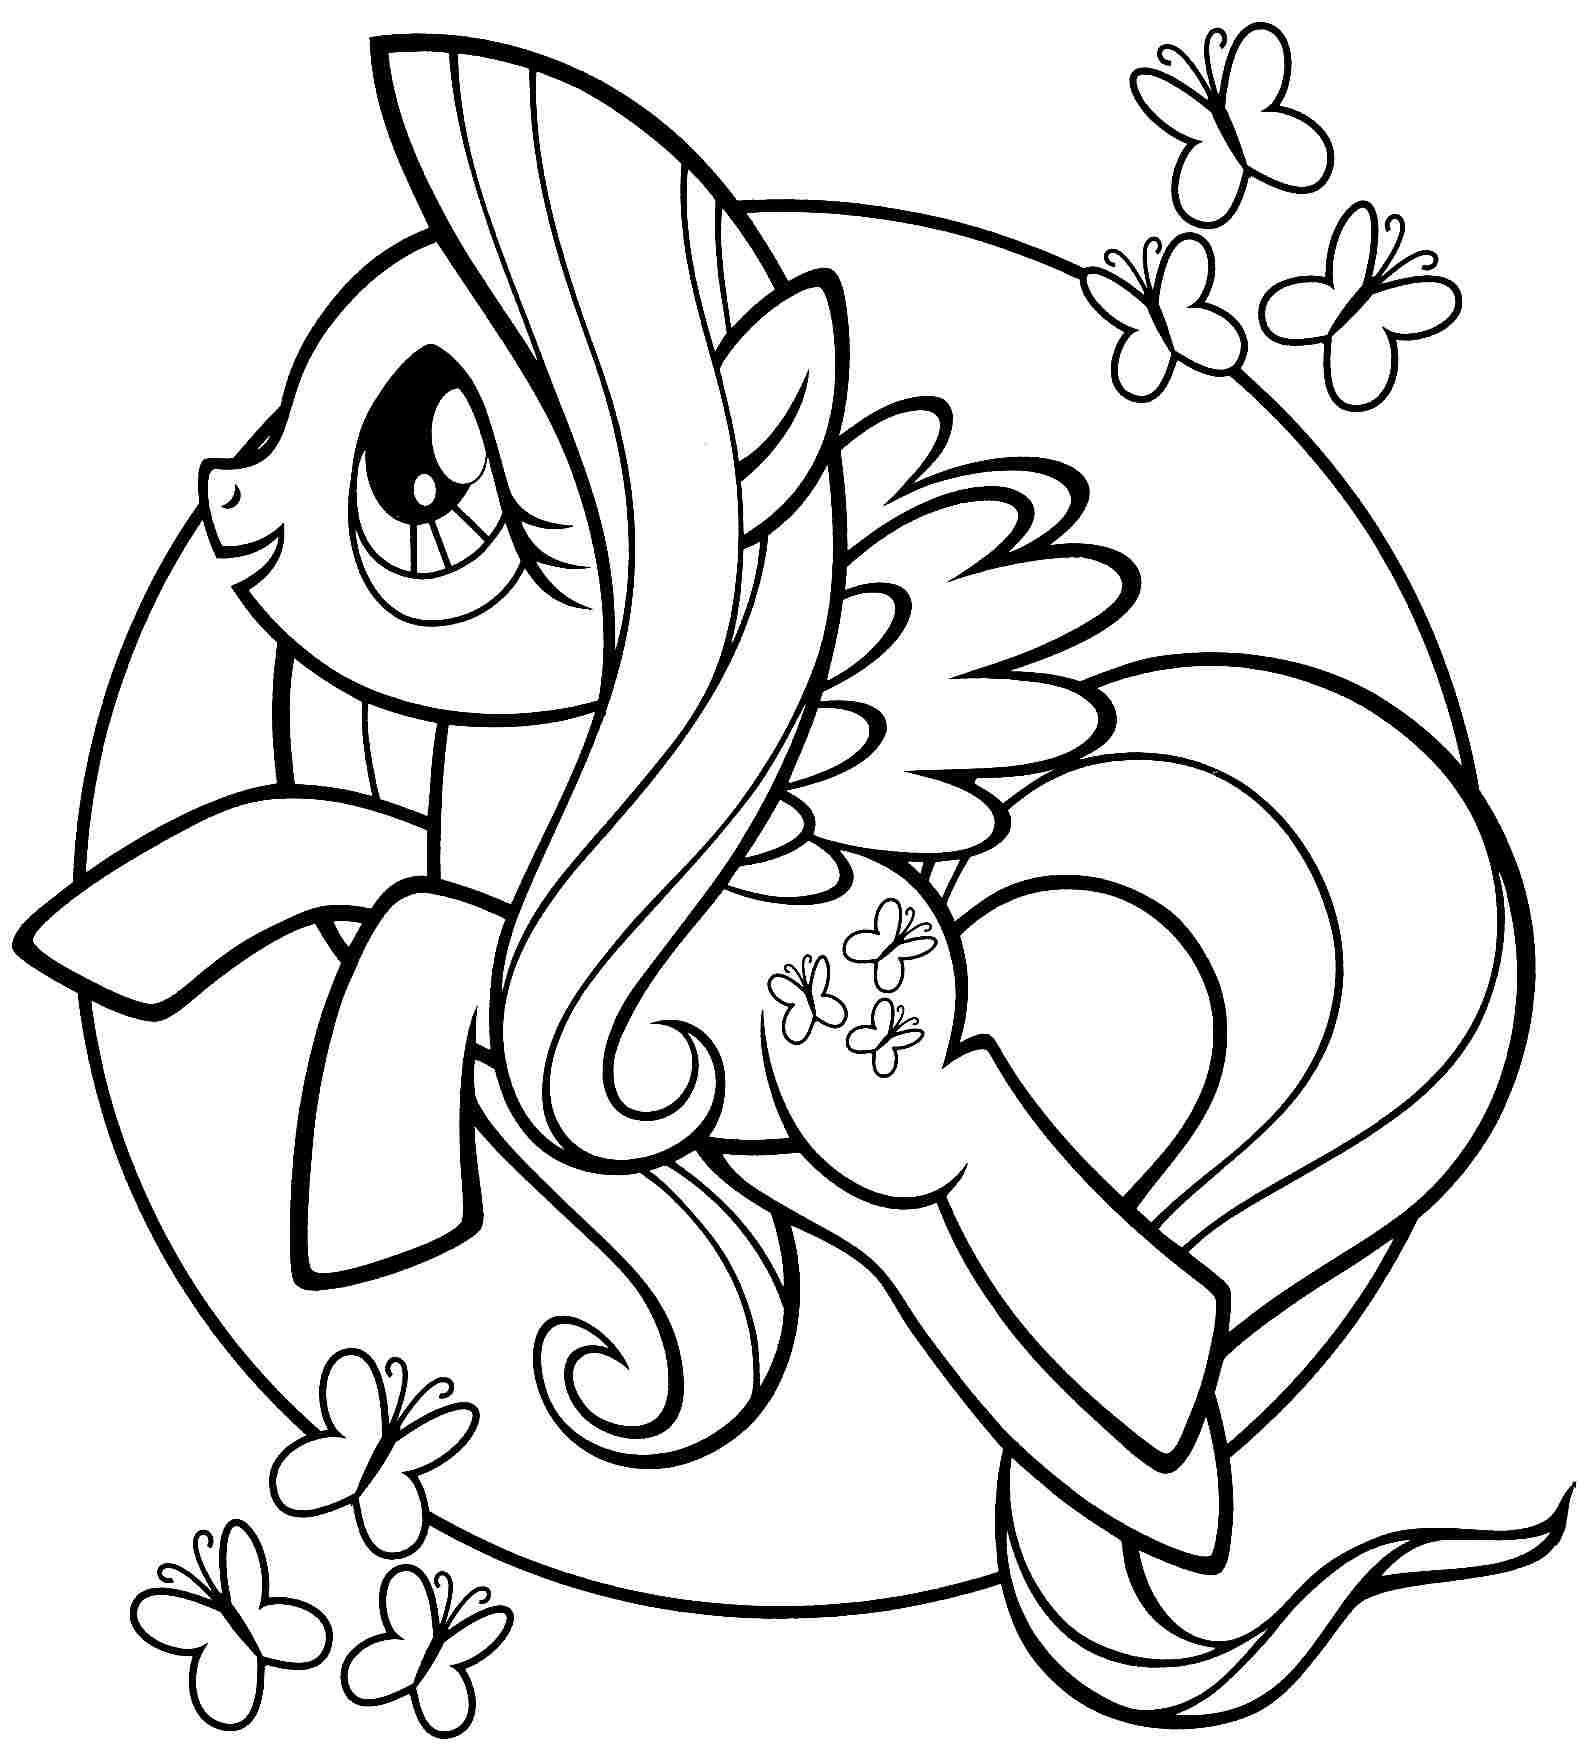 Ausmalbilder My Little Pony Fluttershy : Pin Ni Christian Malpartida Sa My Little Pony Pinterest